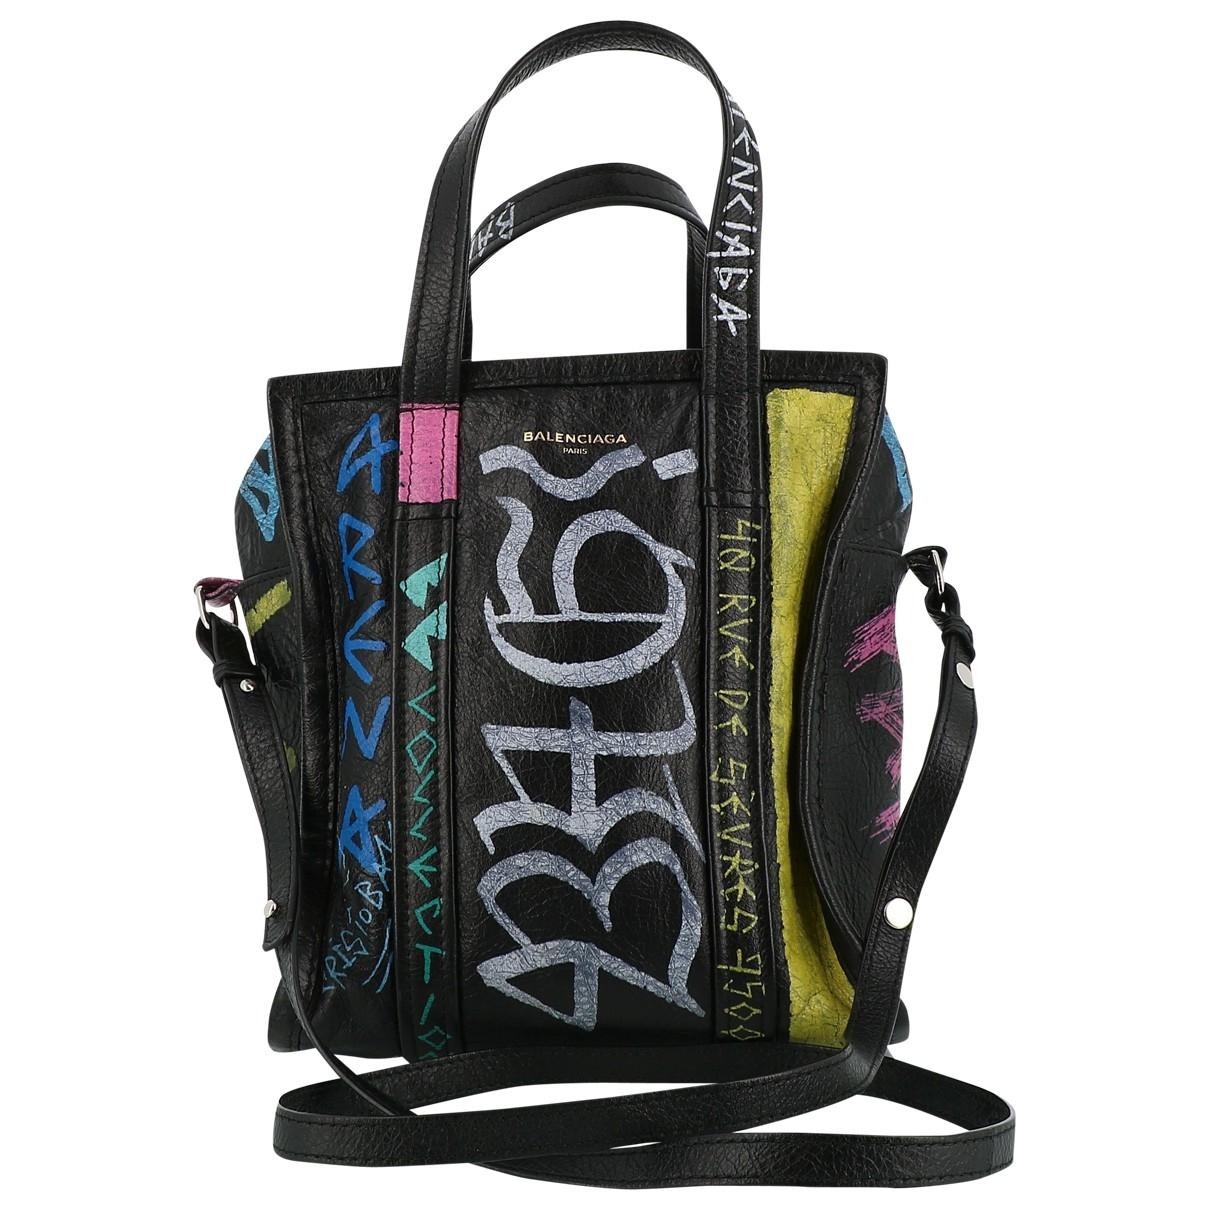 Balenciaga Bazar Bag Black Leather handbag for Women \N